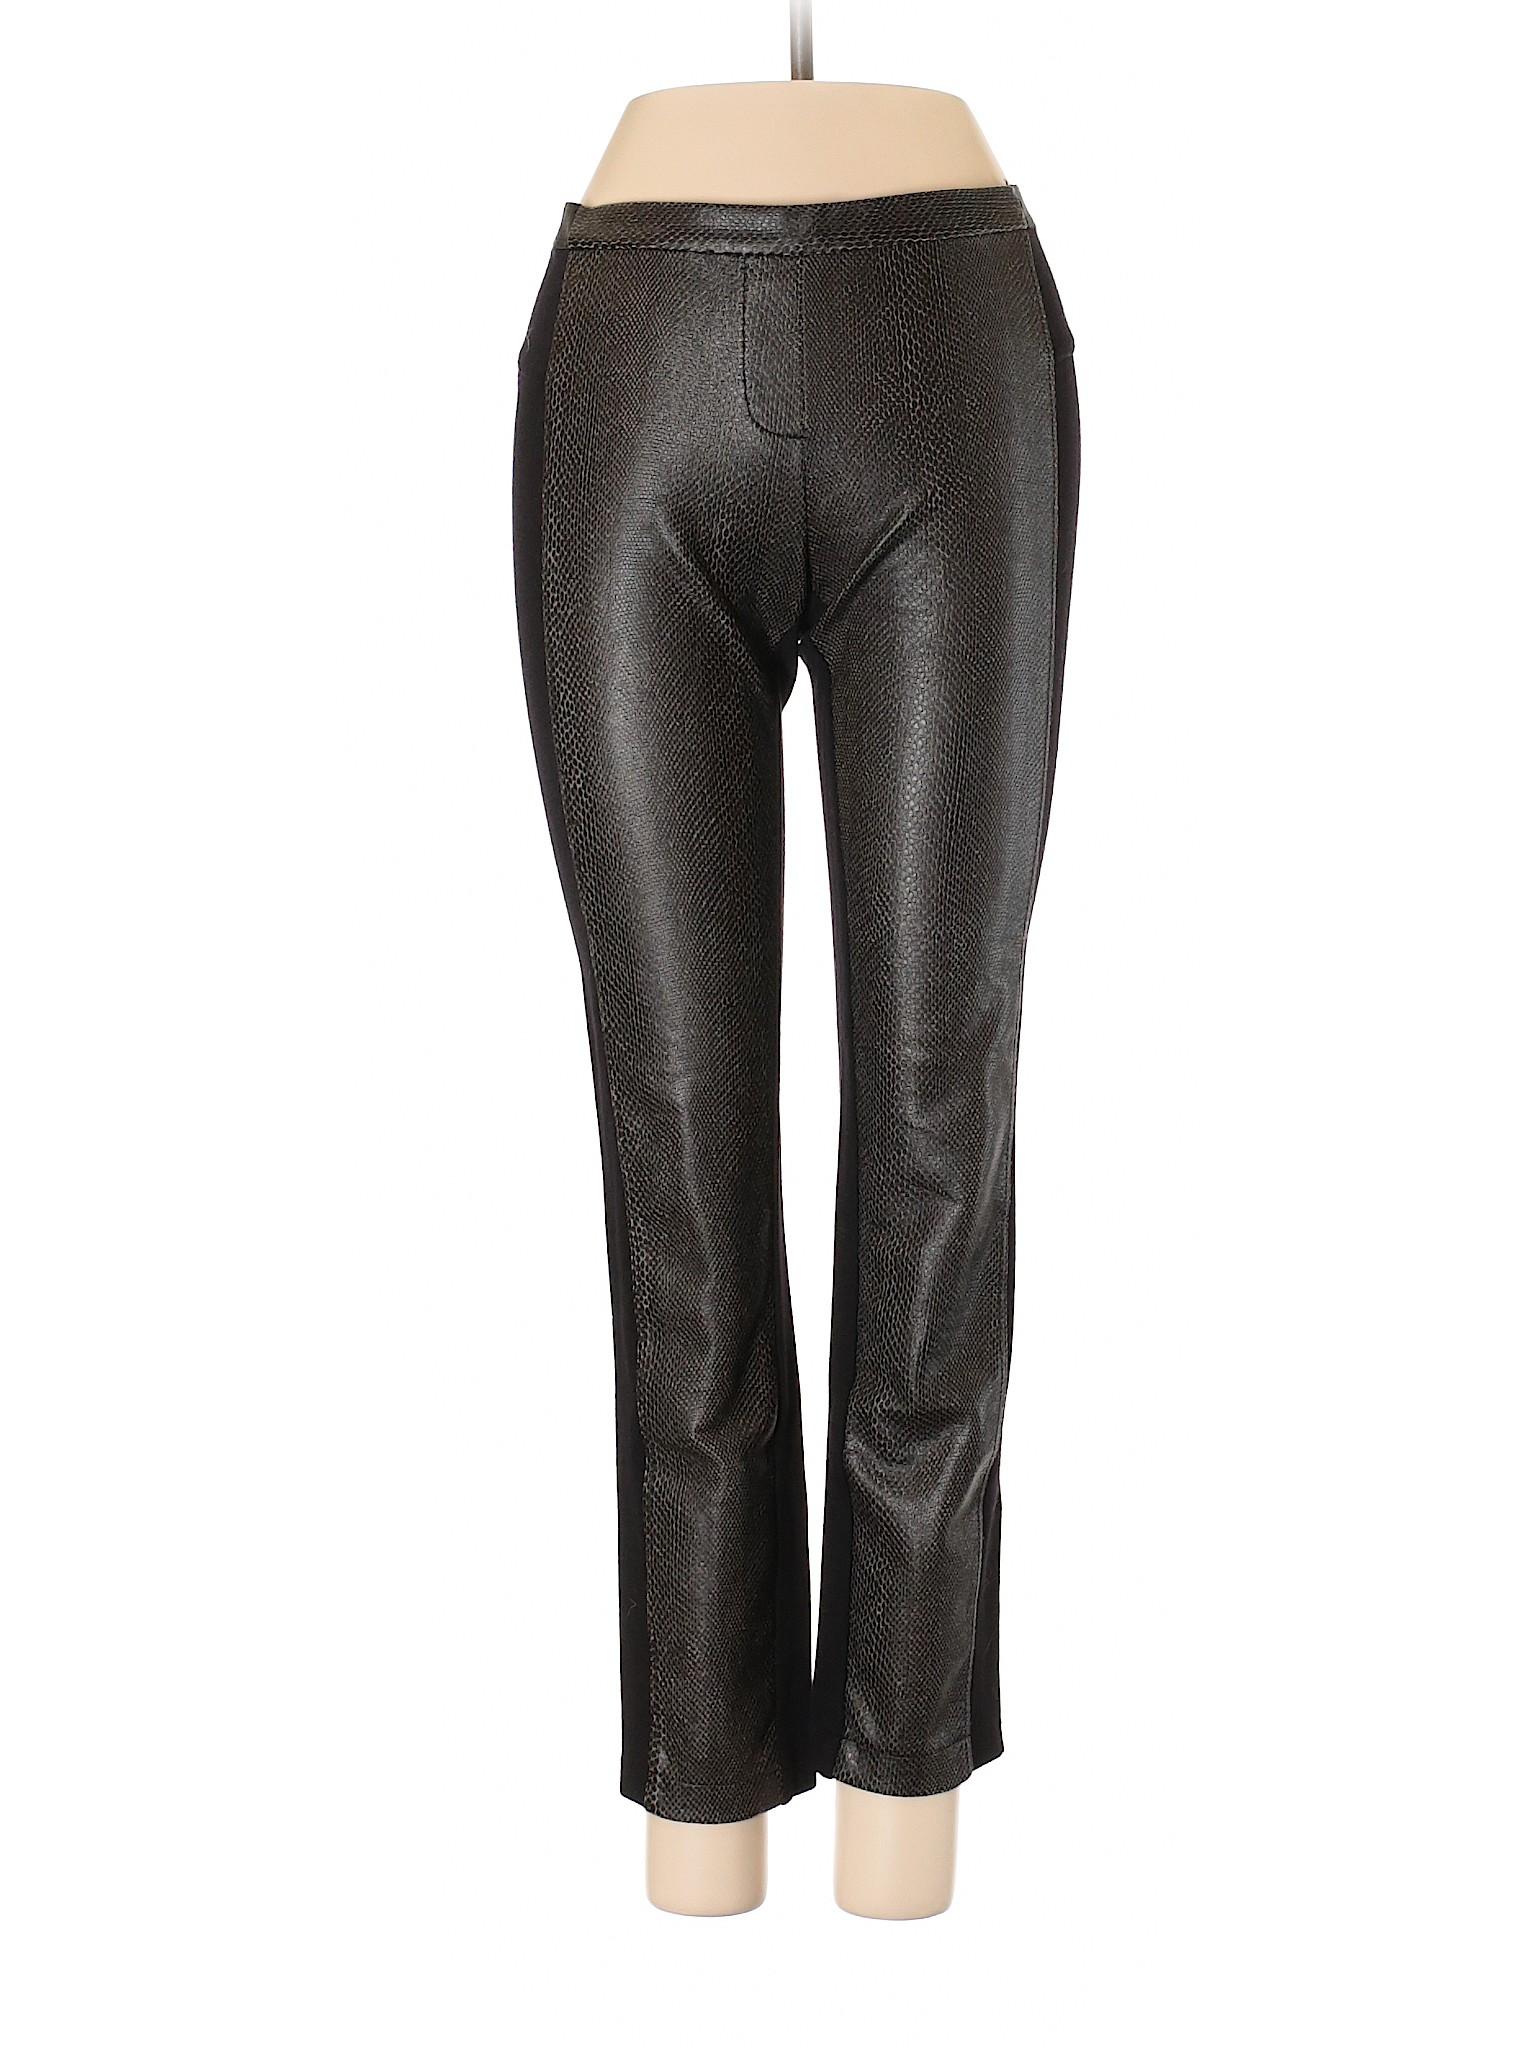 Leather Boutique BCBGMAXAZRIA Faux winter Pants wXqxwn0RPU